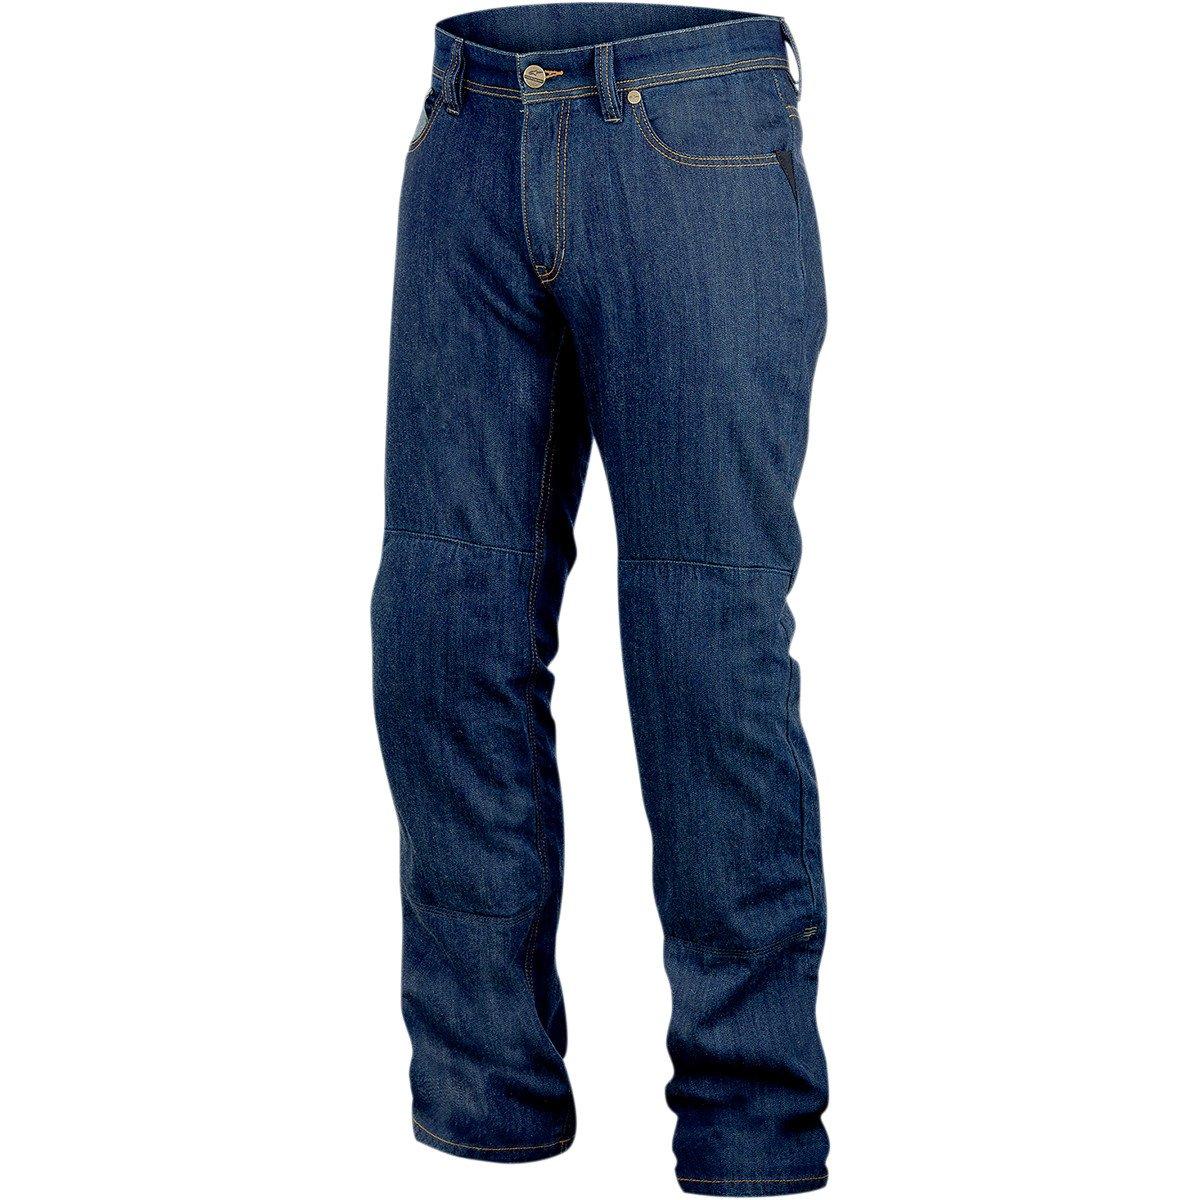 Alpinestars Resist Tech Mens Denim On-Road Racing Motorcycle Pants - Blue/Size 30